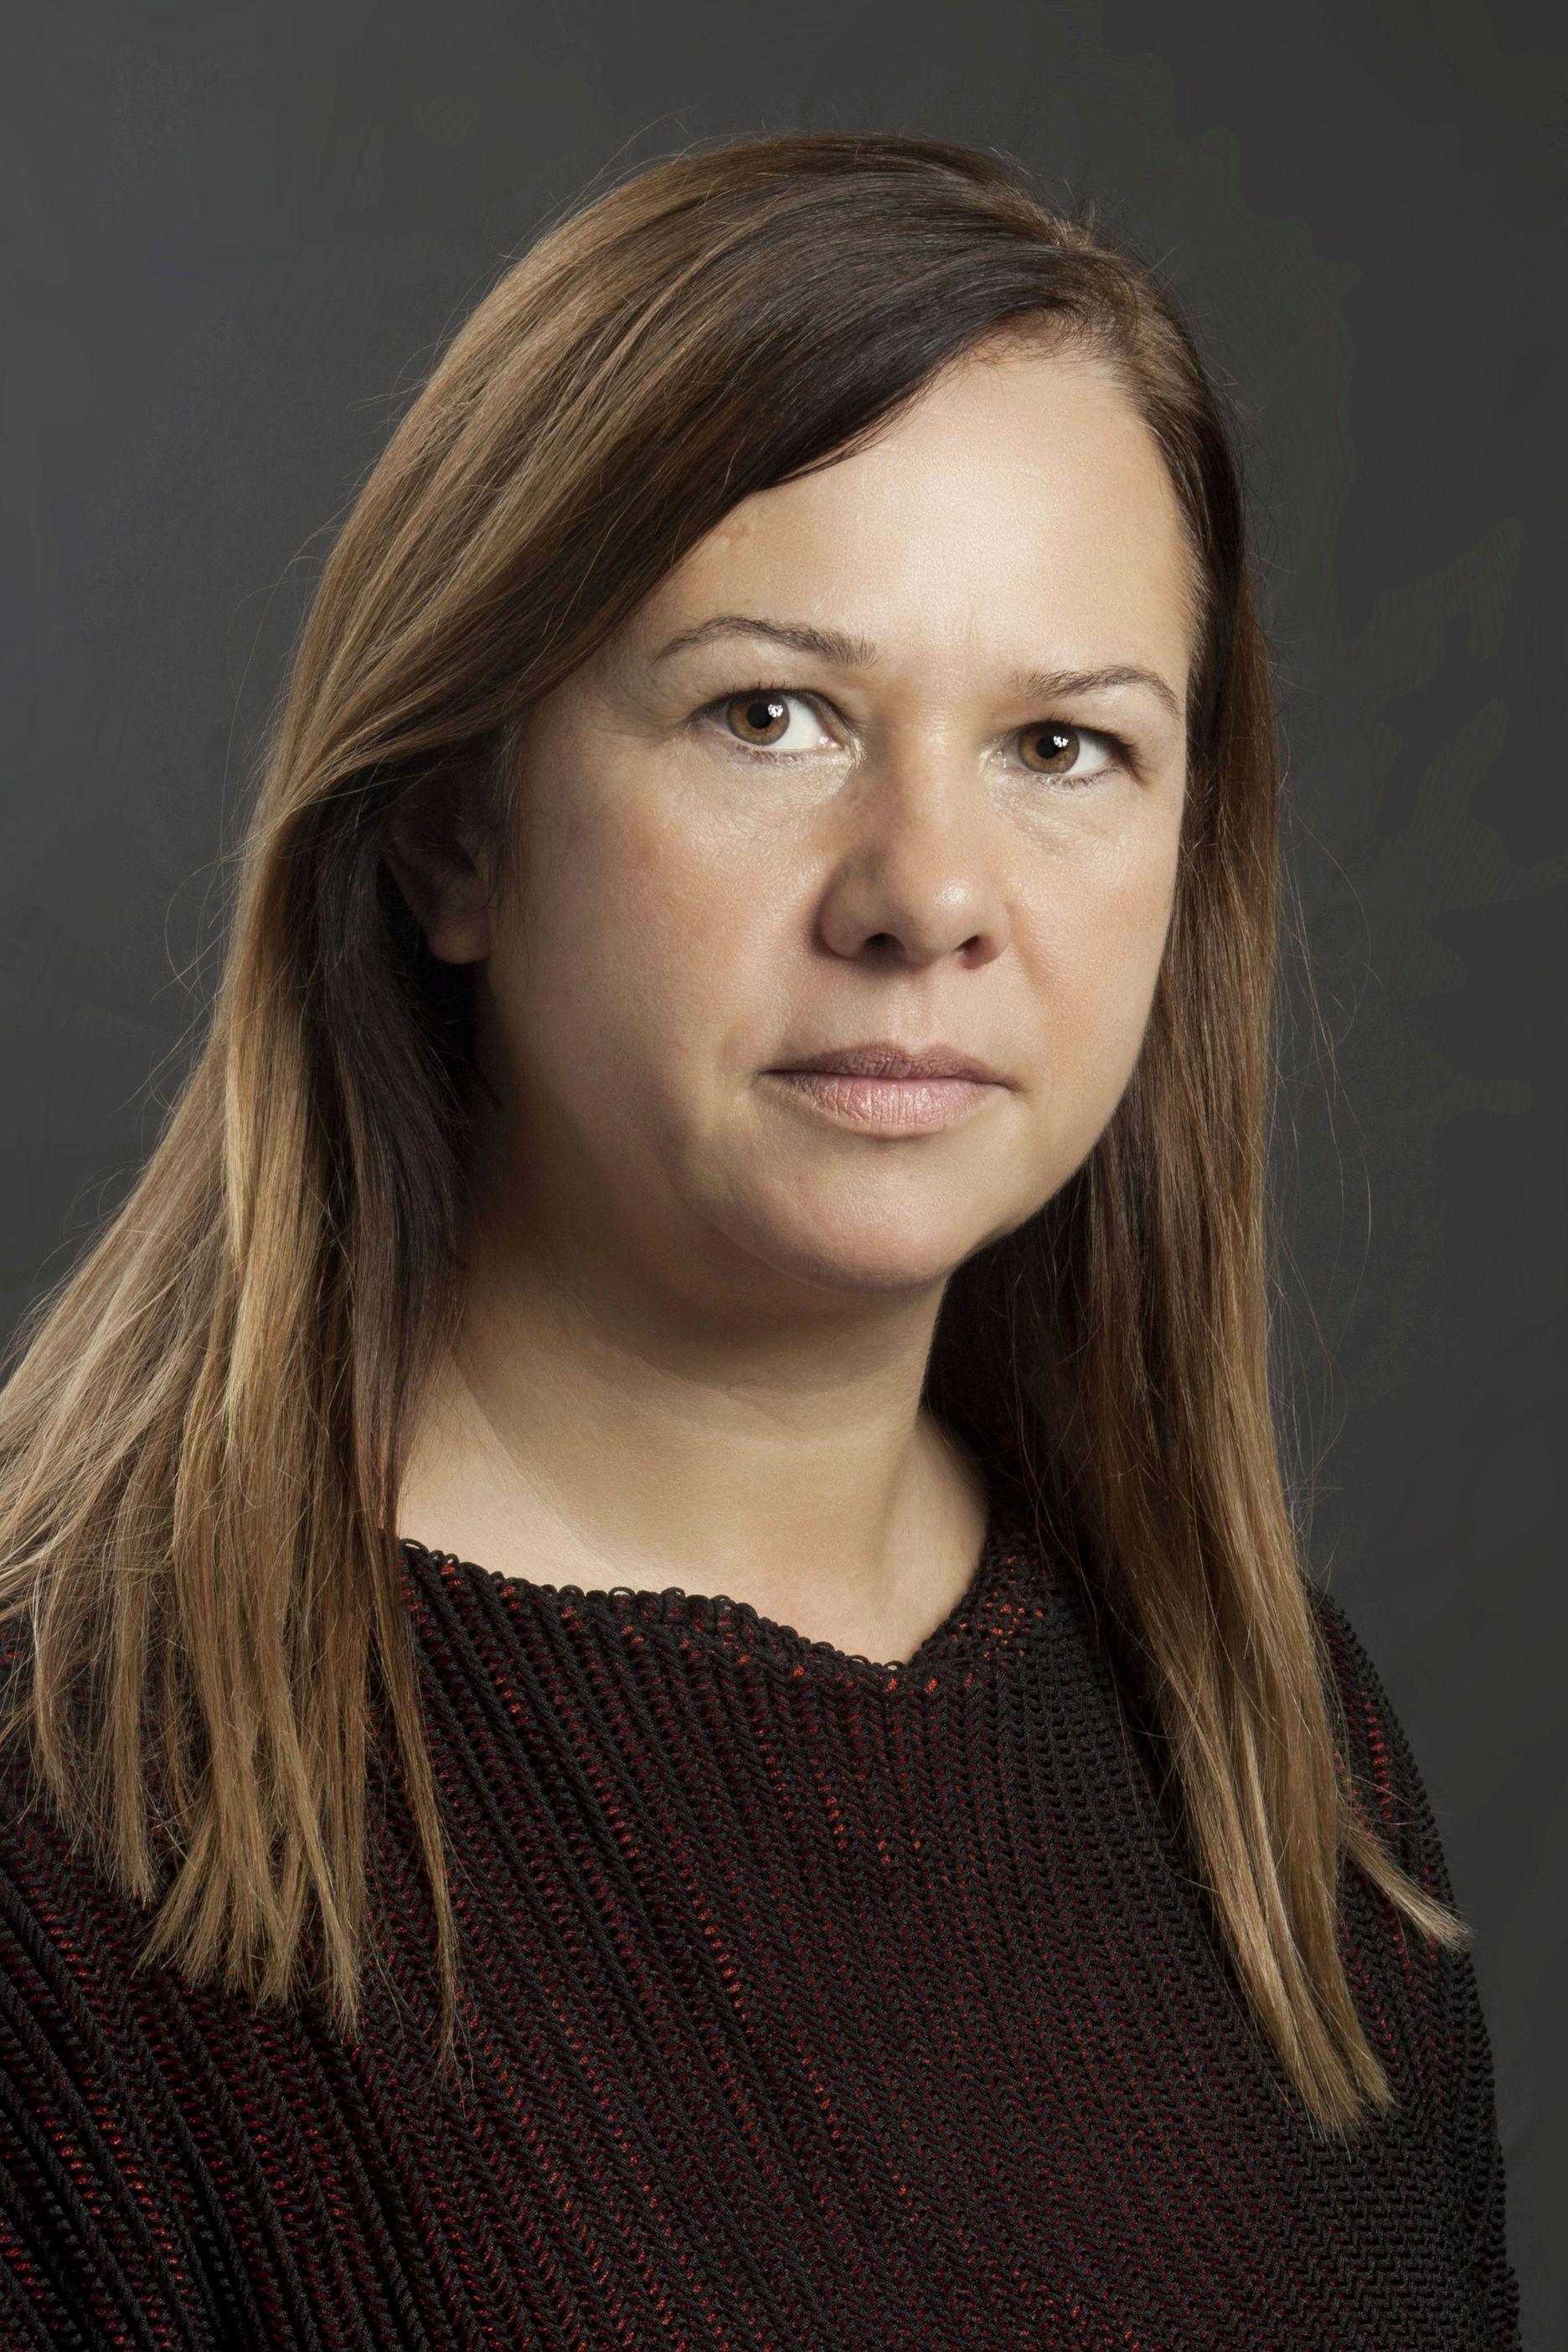 doc. dr Malina Čvoro